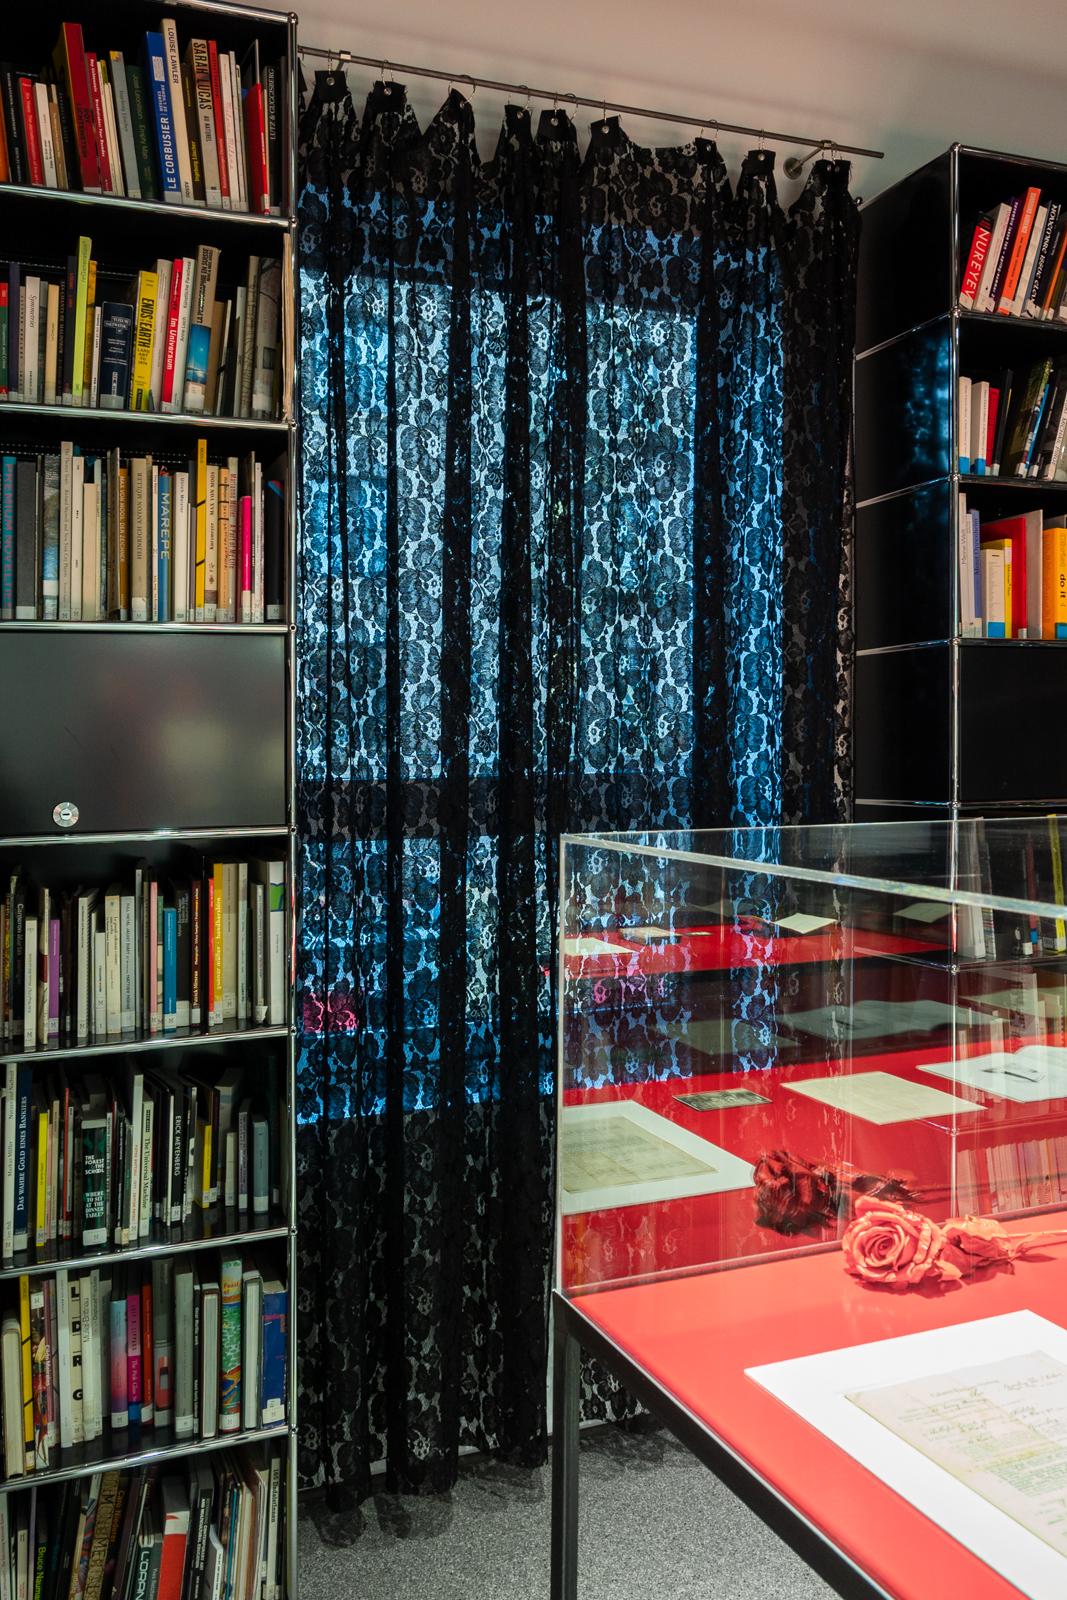 Emmy Hennings / Sitara Abuzar Ghaznawi at Swiss Institute